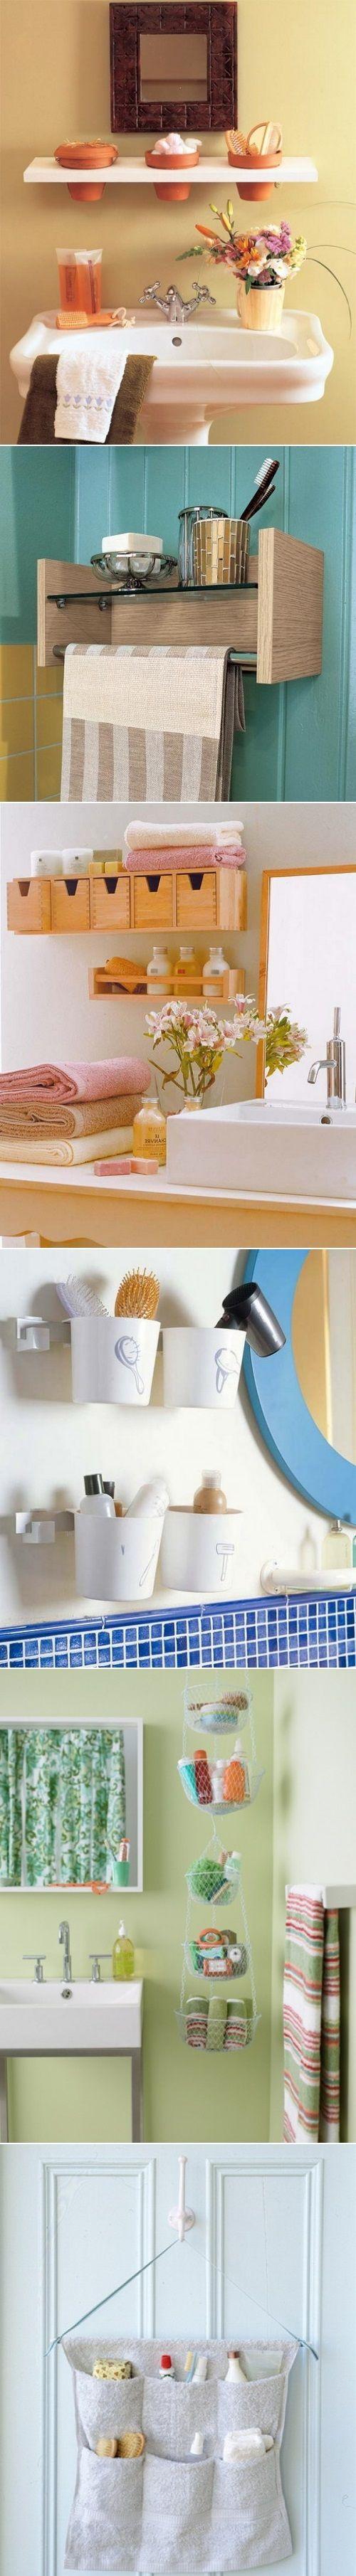 Best Bathrooms Decor Images On Pinterest Bathroom Ideas - Yellow decorative towels for small bathroom ideas